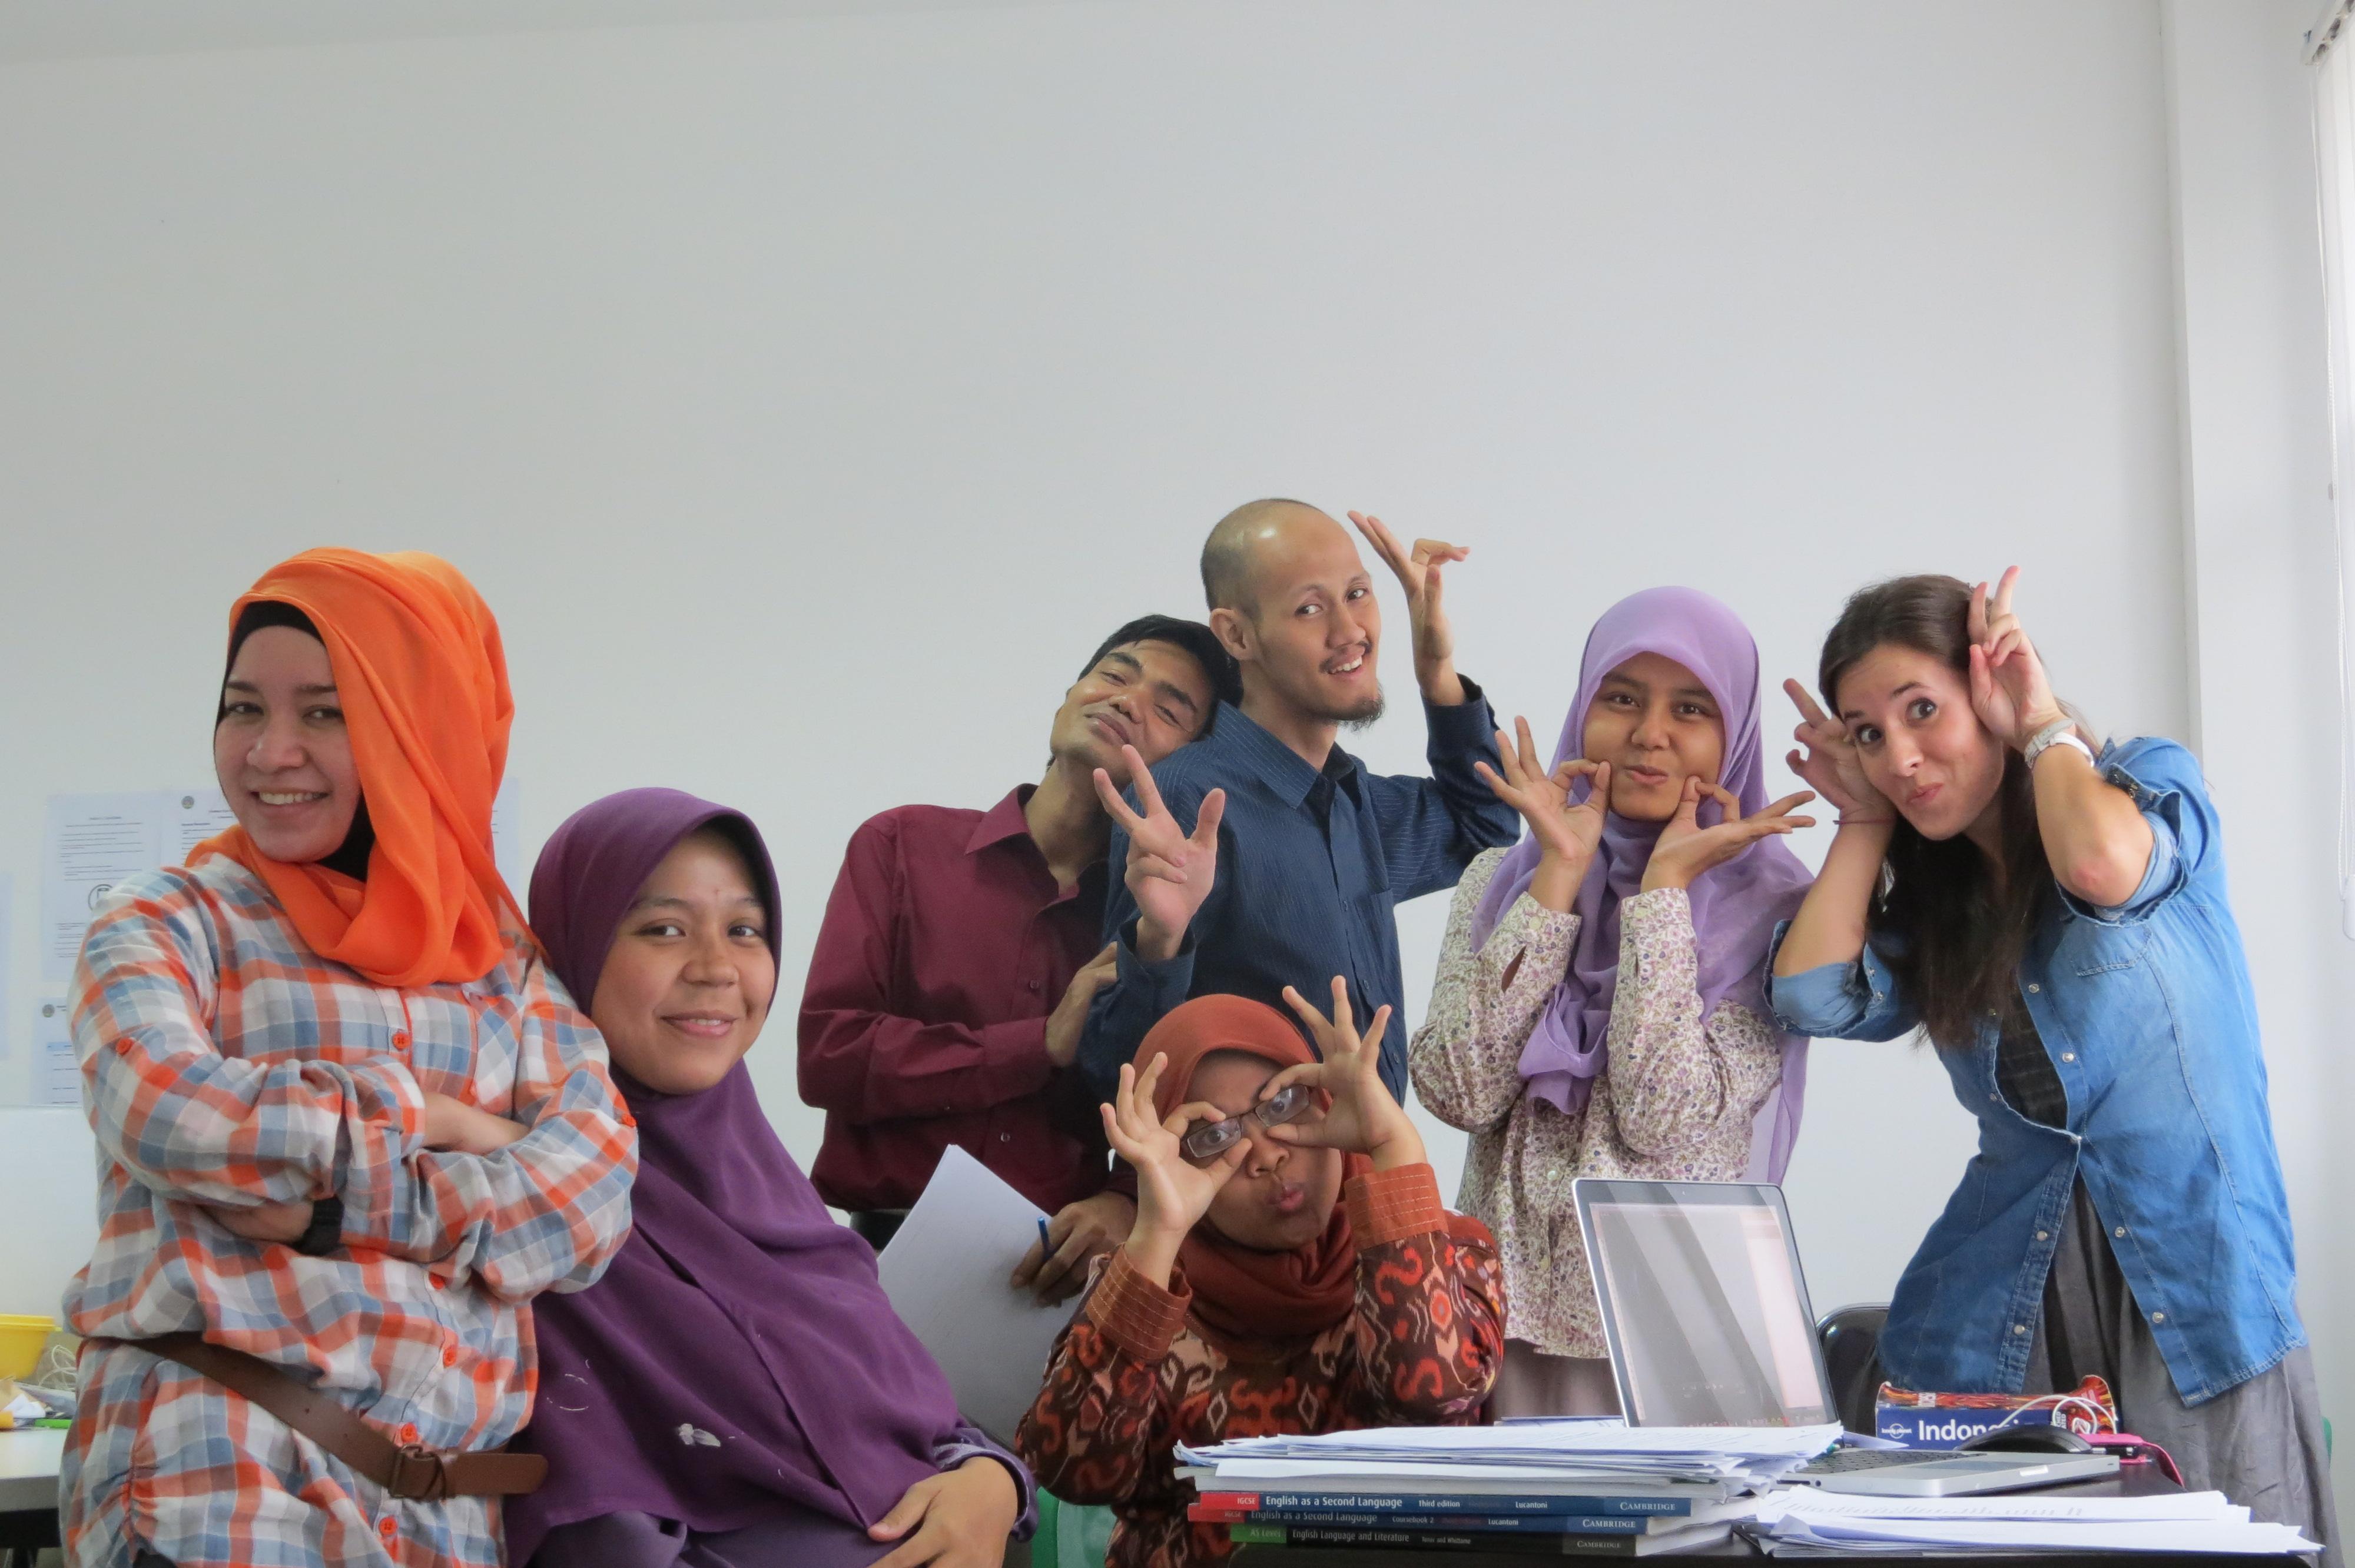 mestra Indonèsia Berta